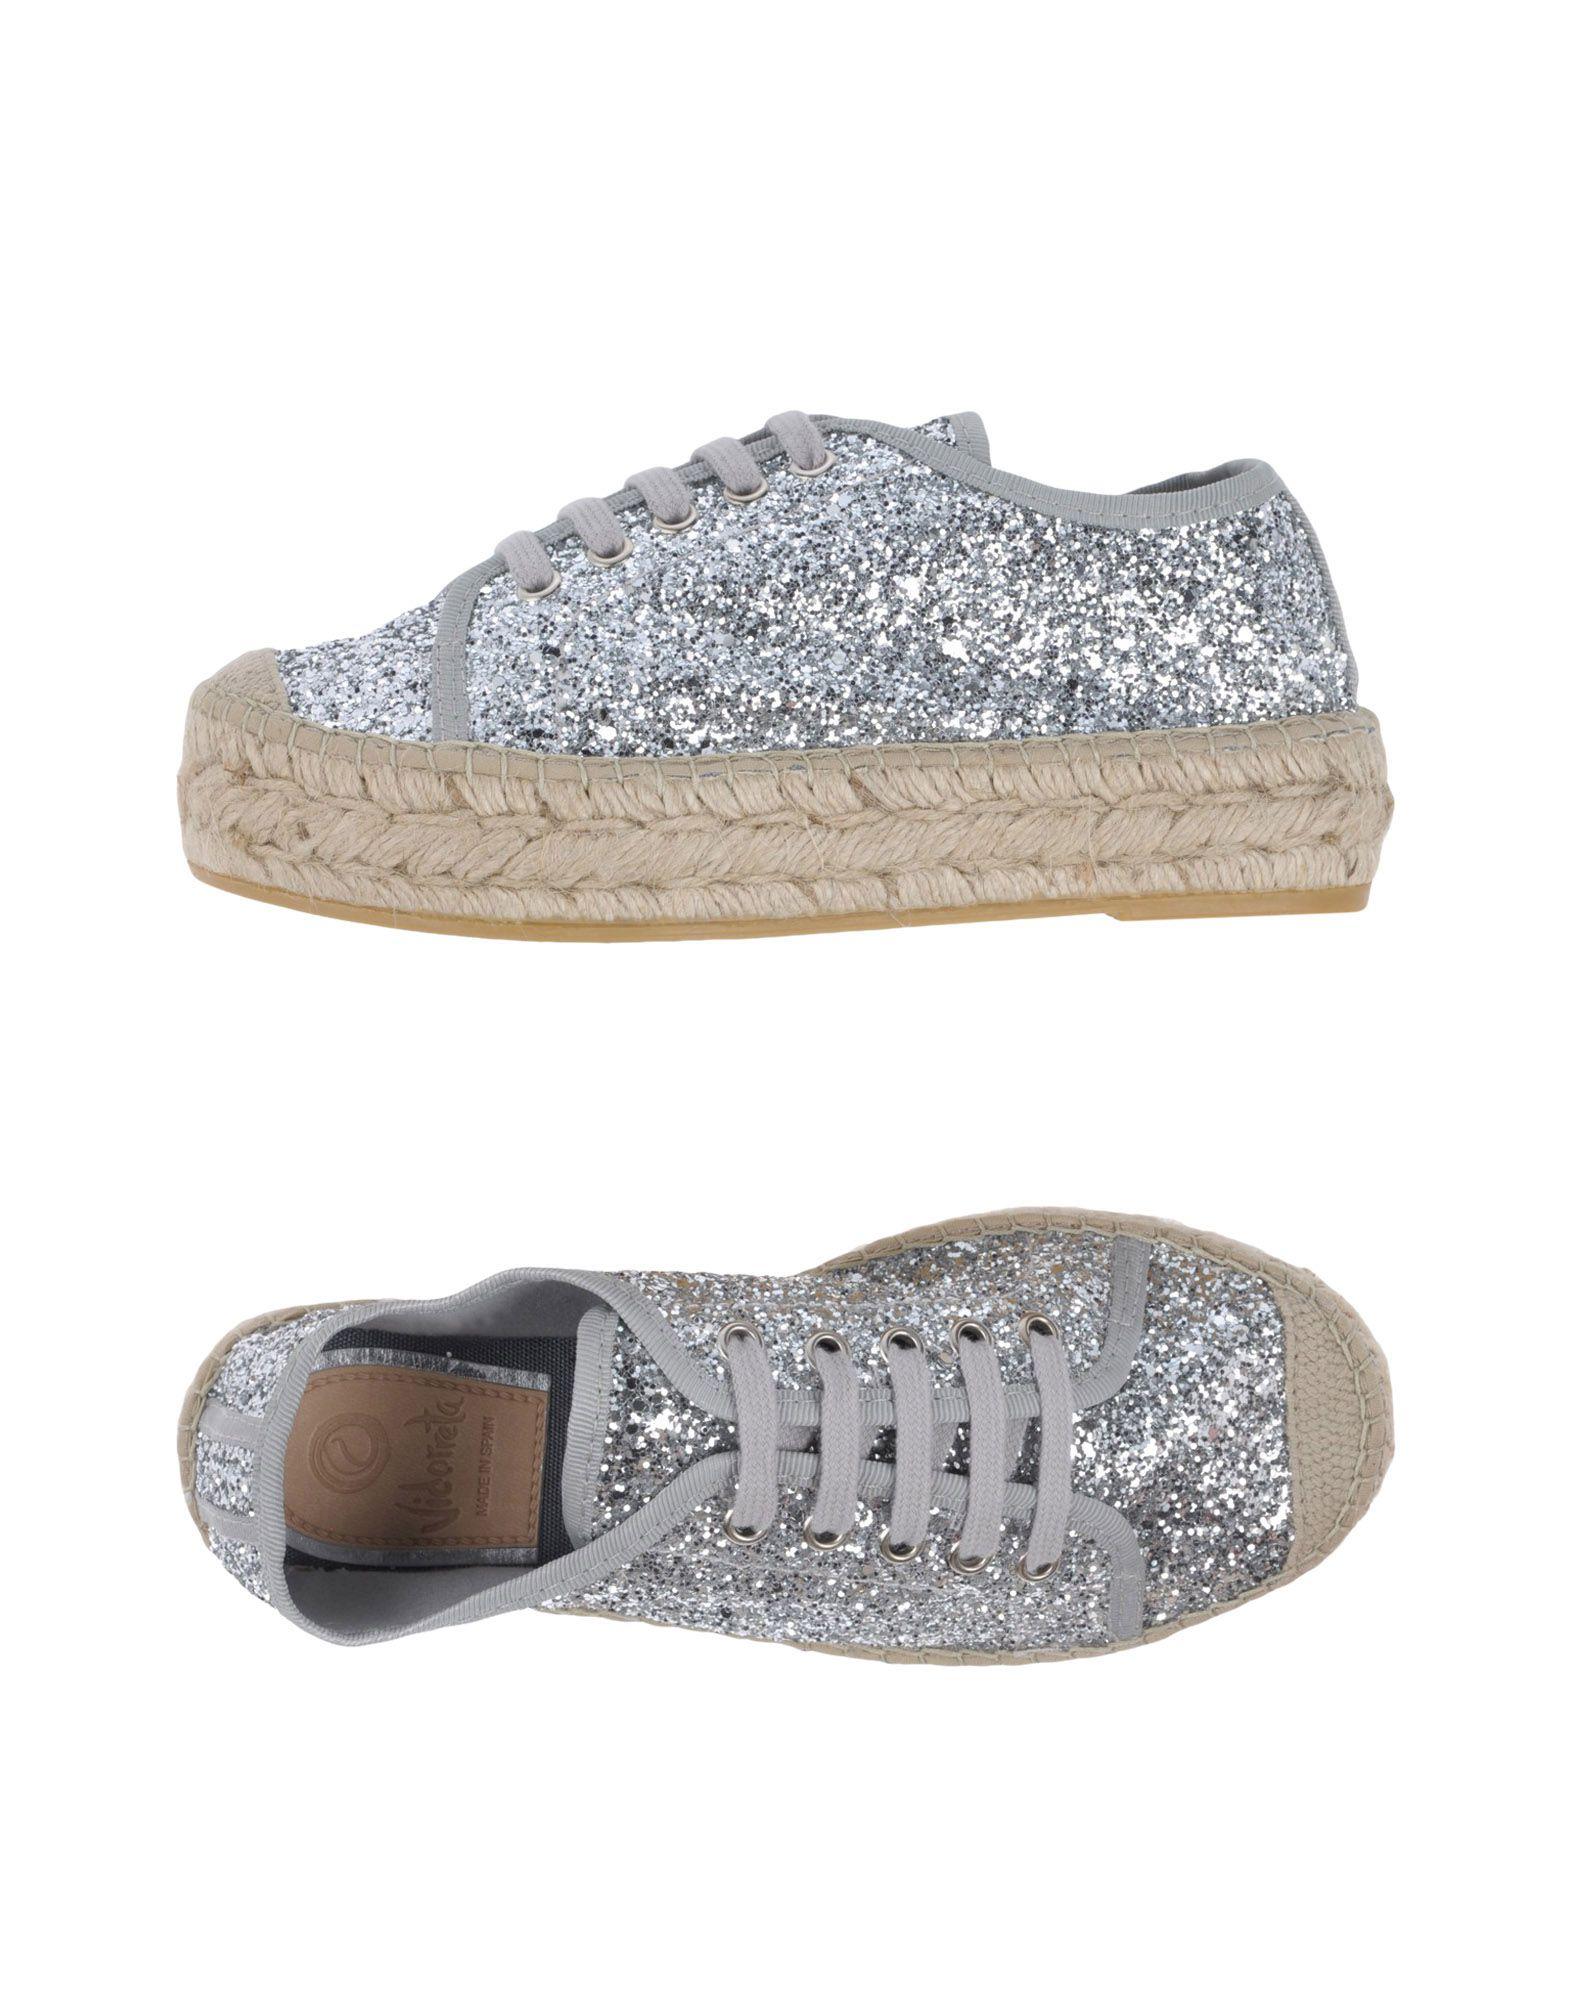 Vidorreta Sneakers Gute Damen  11387402JT Gute Sneakers Qualität beliebte Schuhe 4bc4b7